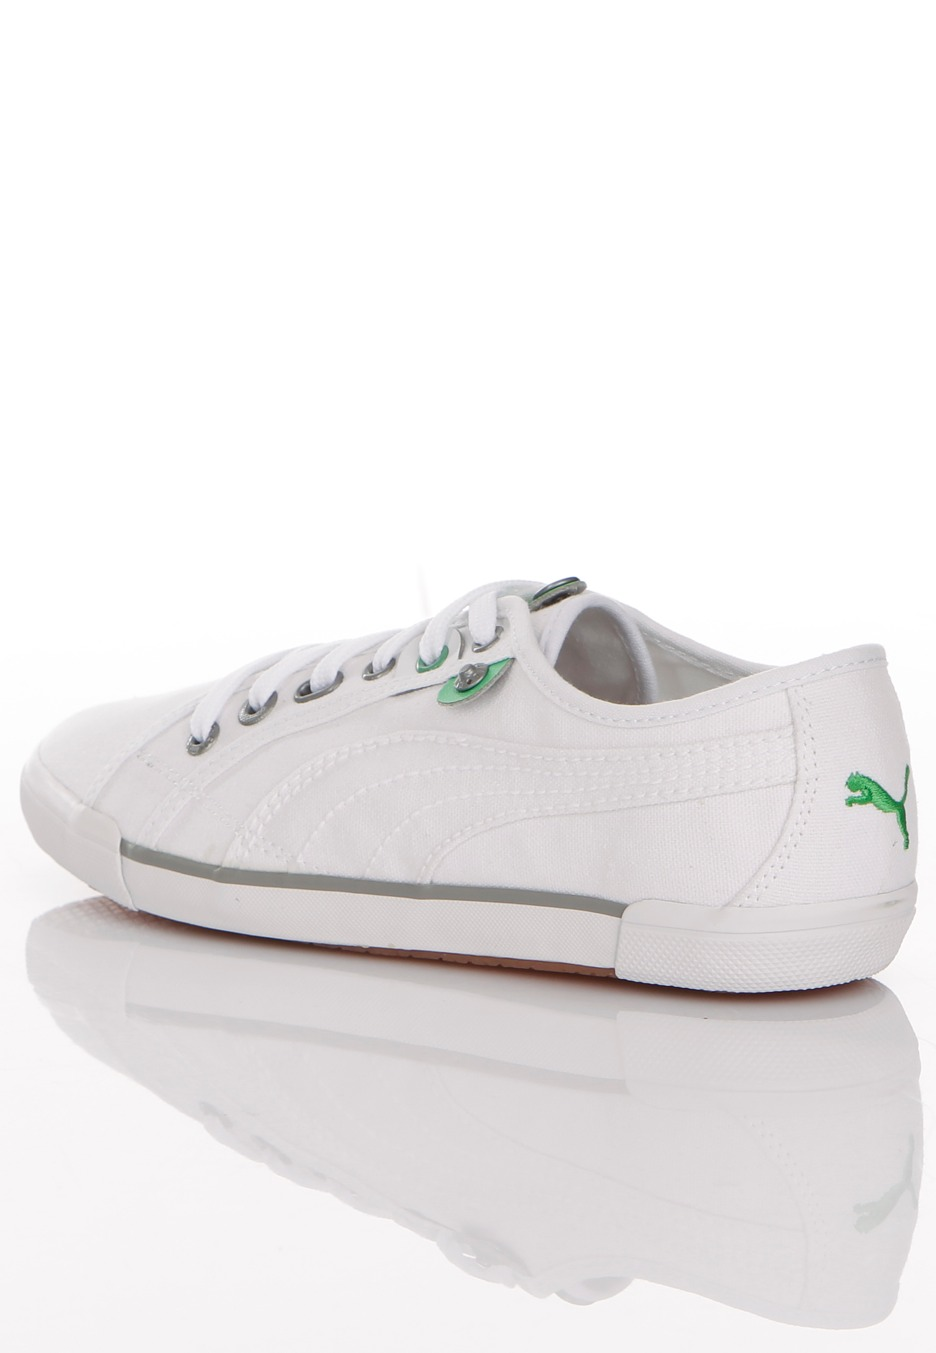 check out 61035 ba779 puma corsica white girlshoes side lg.jpg